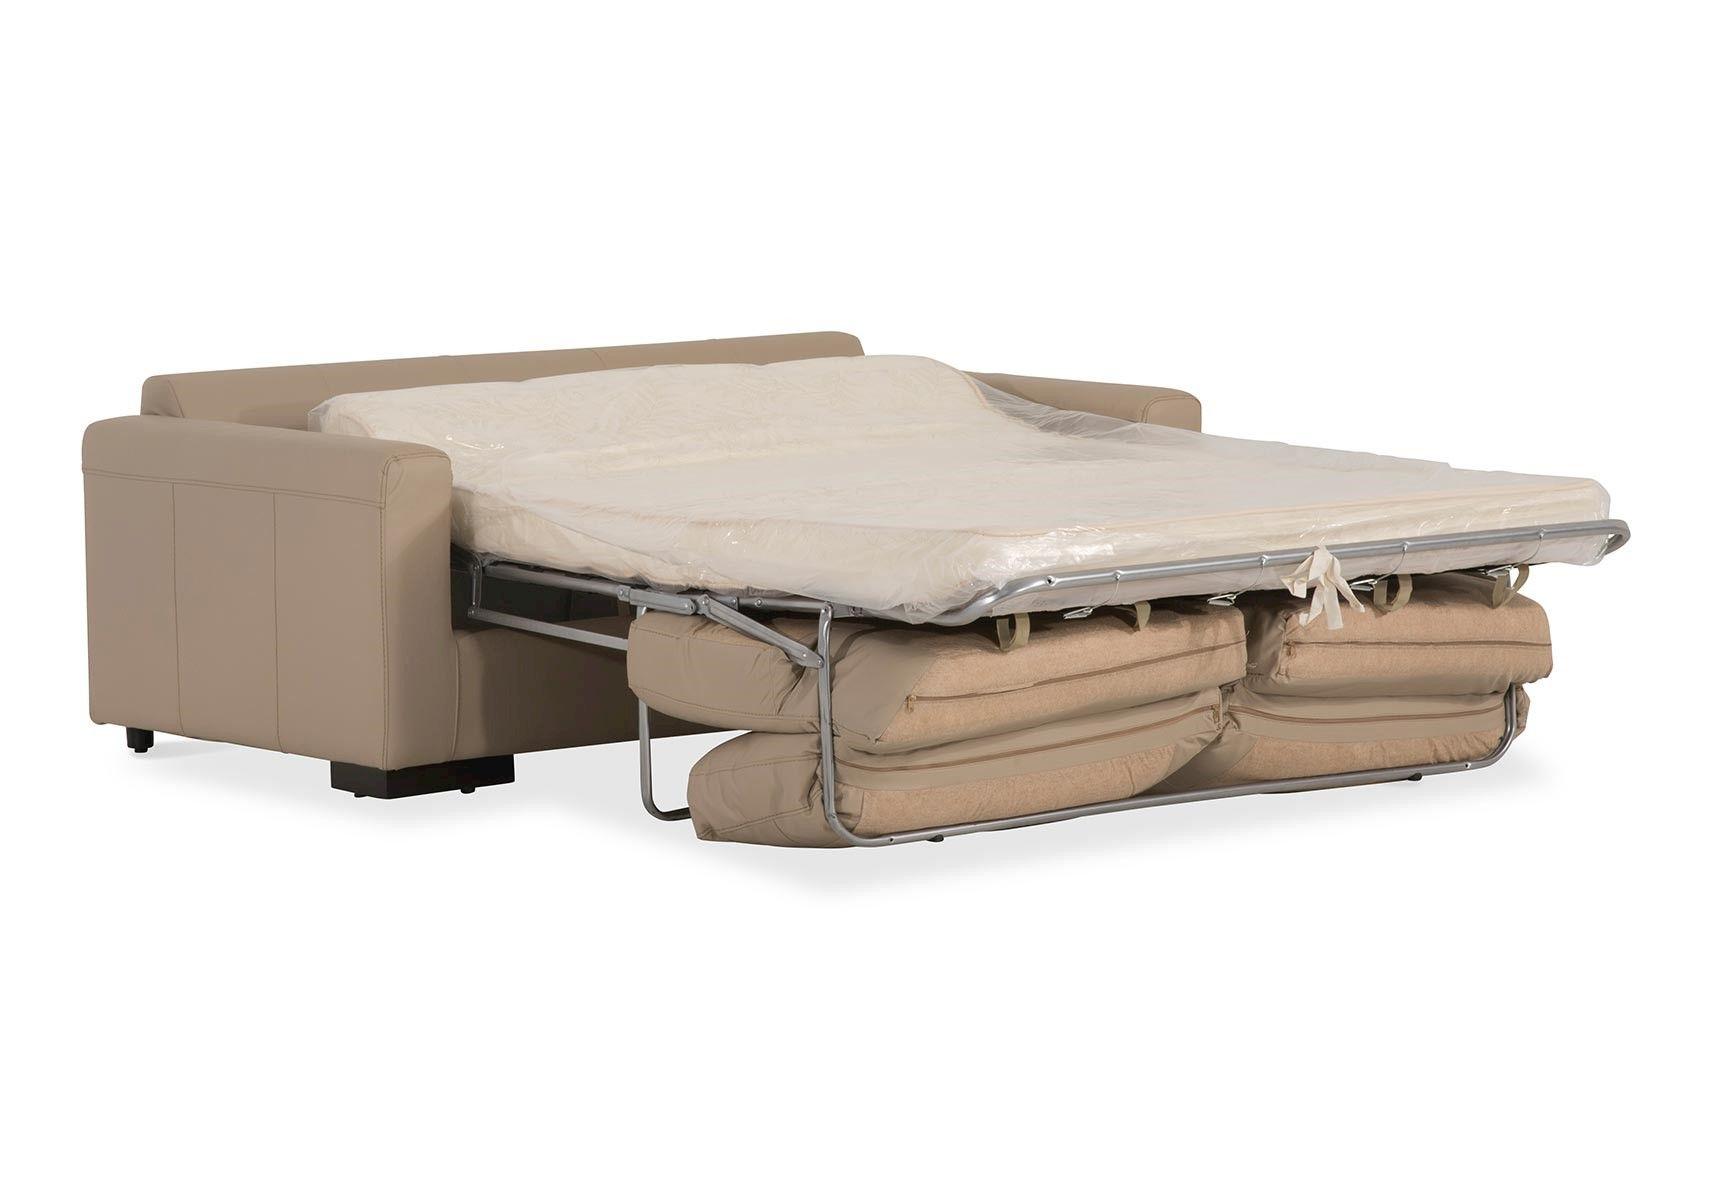 Brilliant Lacks Bull Sofa Sleeper Home For The Holidays Sleeper Lamtechconsult Wood Chair Design Ideas Lamtechconsultcom